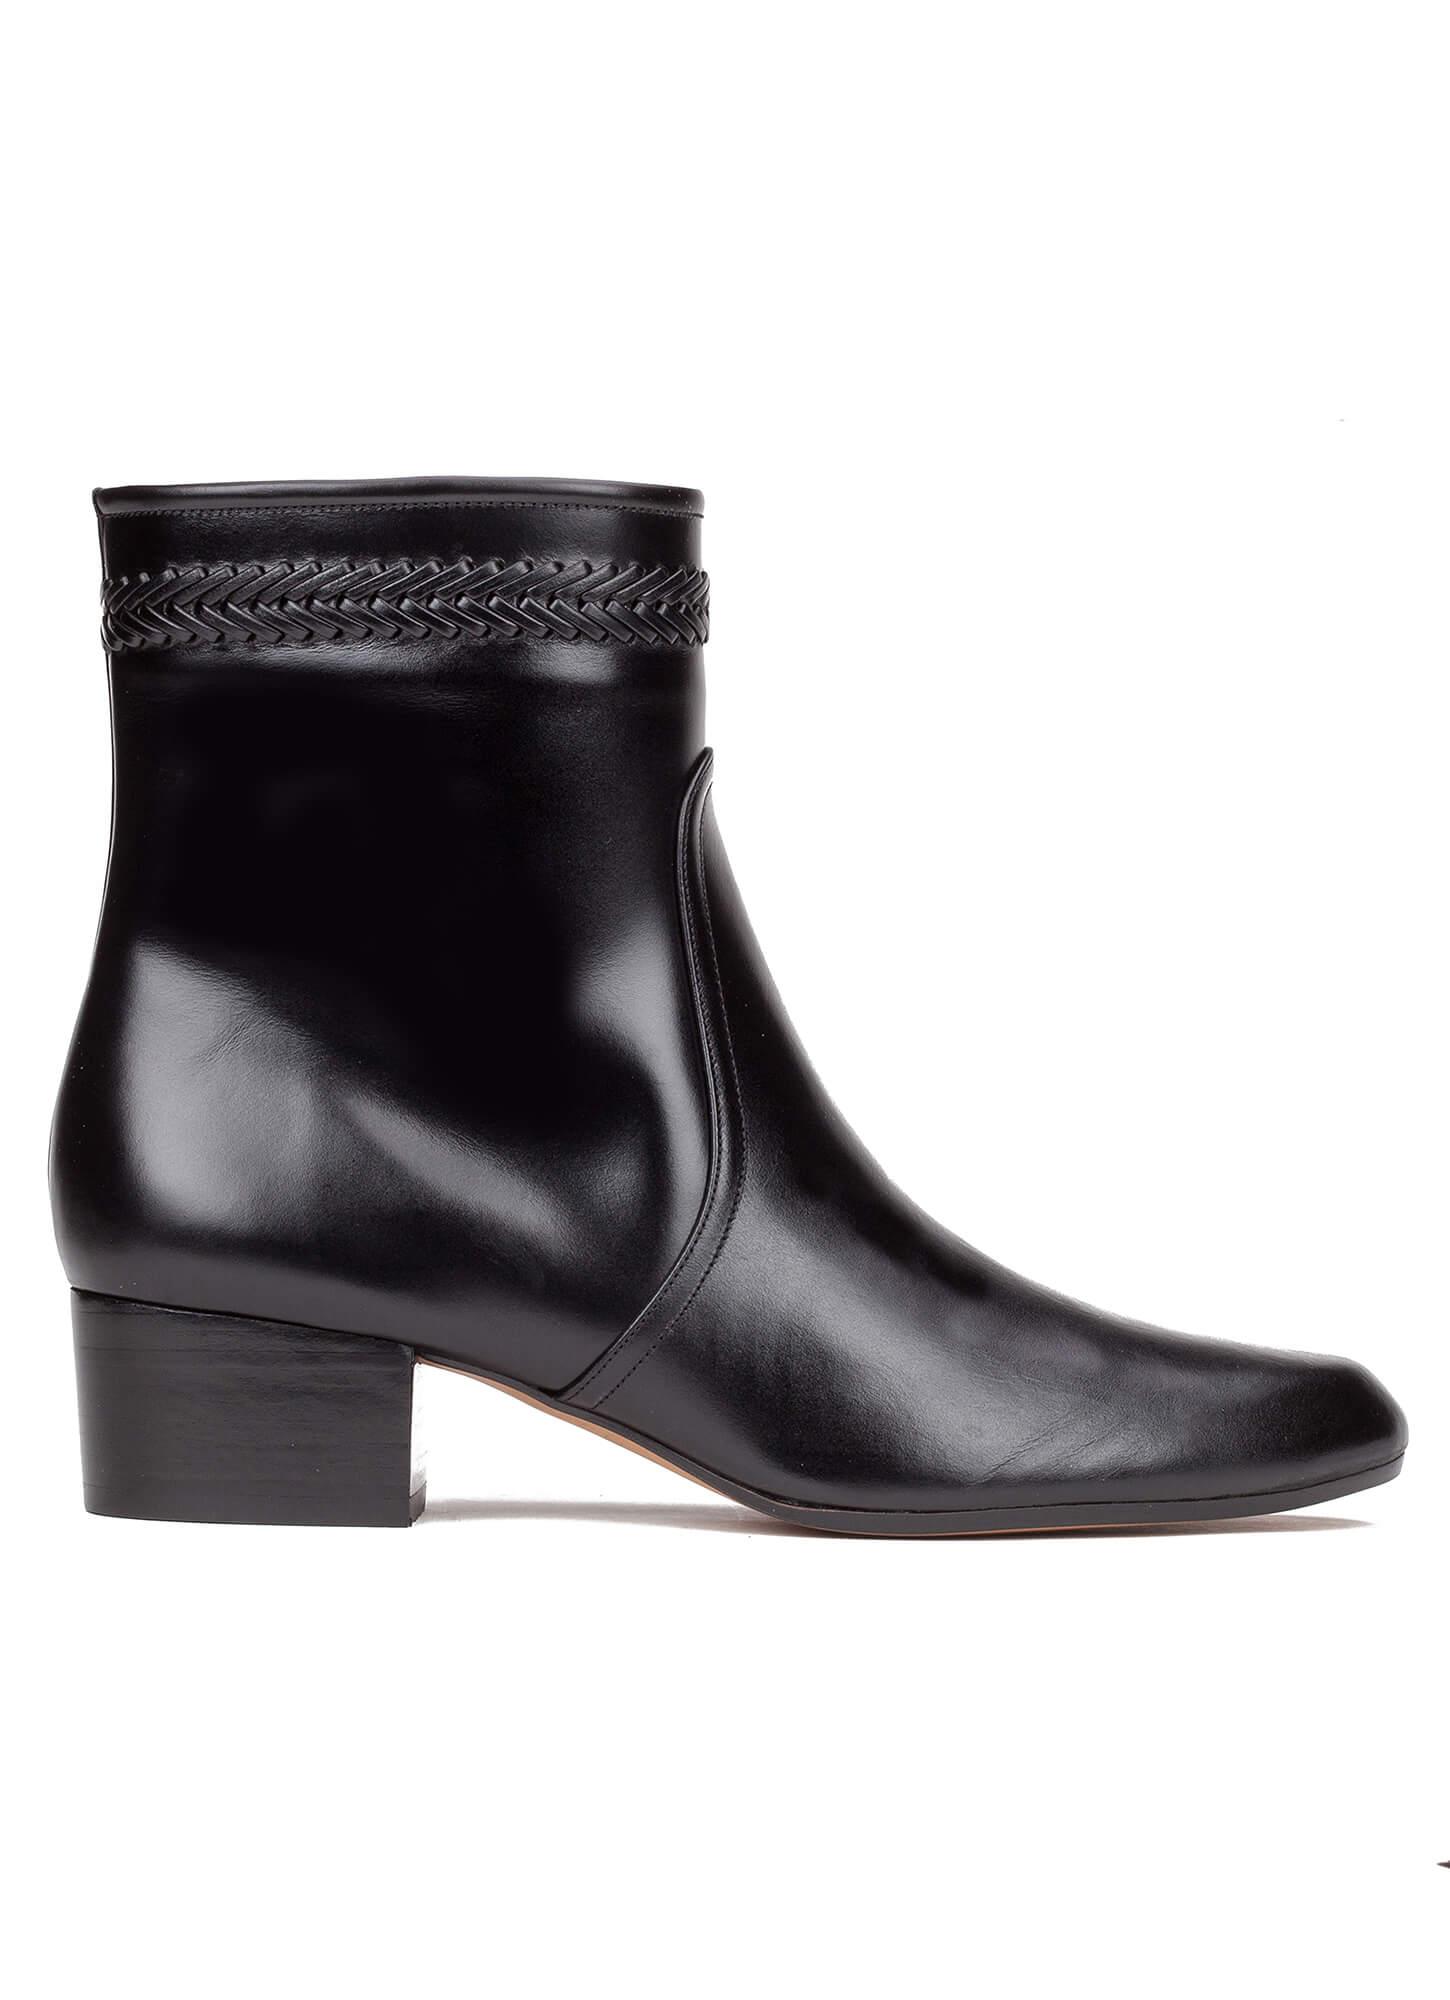 d65c5533c9827 ... online shoe store Pura Lopez. Lara Pura López. Braided detail low heel  ankle boots in black leather ...